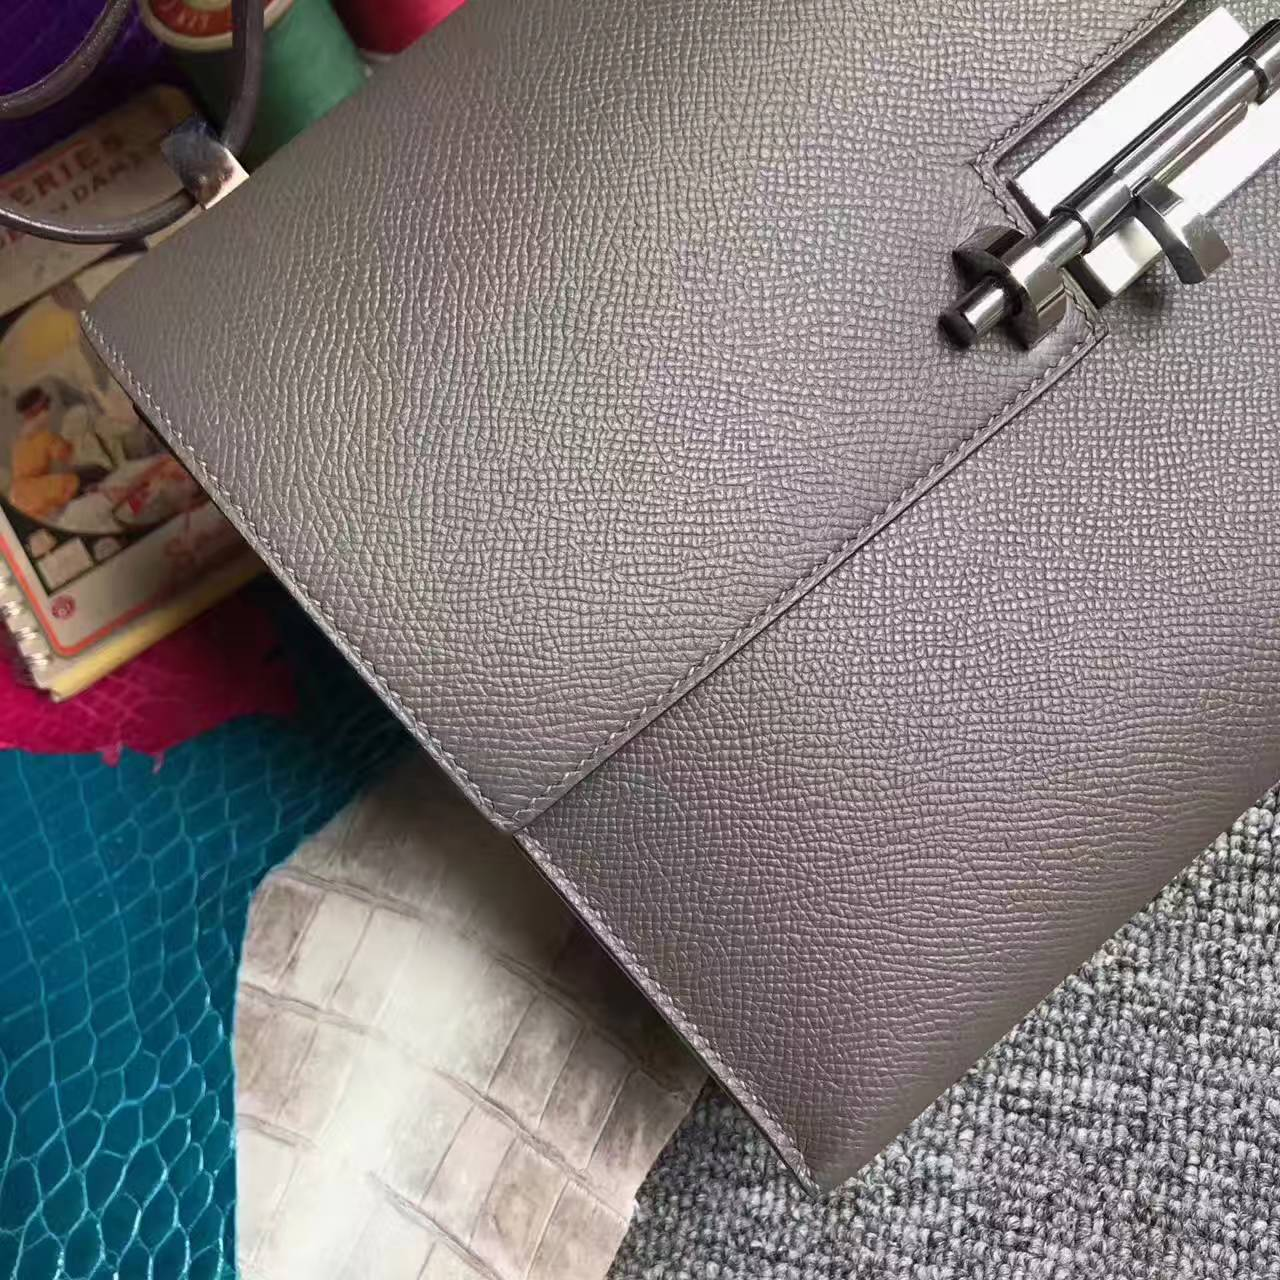 Wholesale Hermes Etain Grey Epsom Leather Verrou Shoulder Bag 24cm